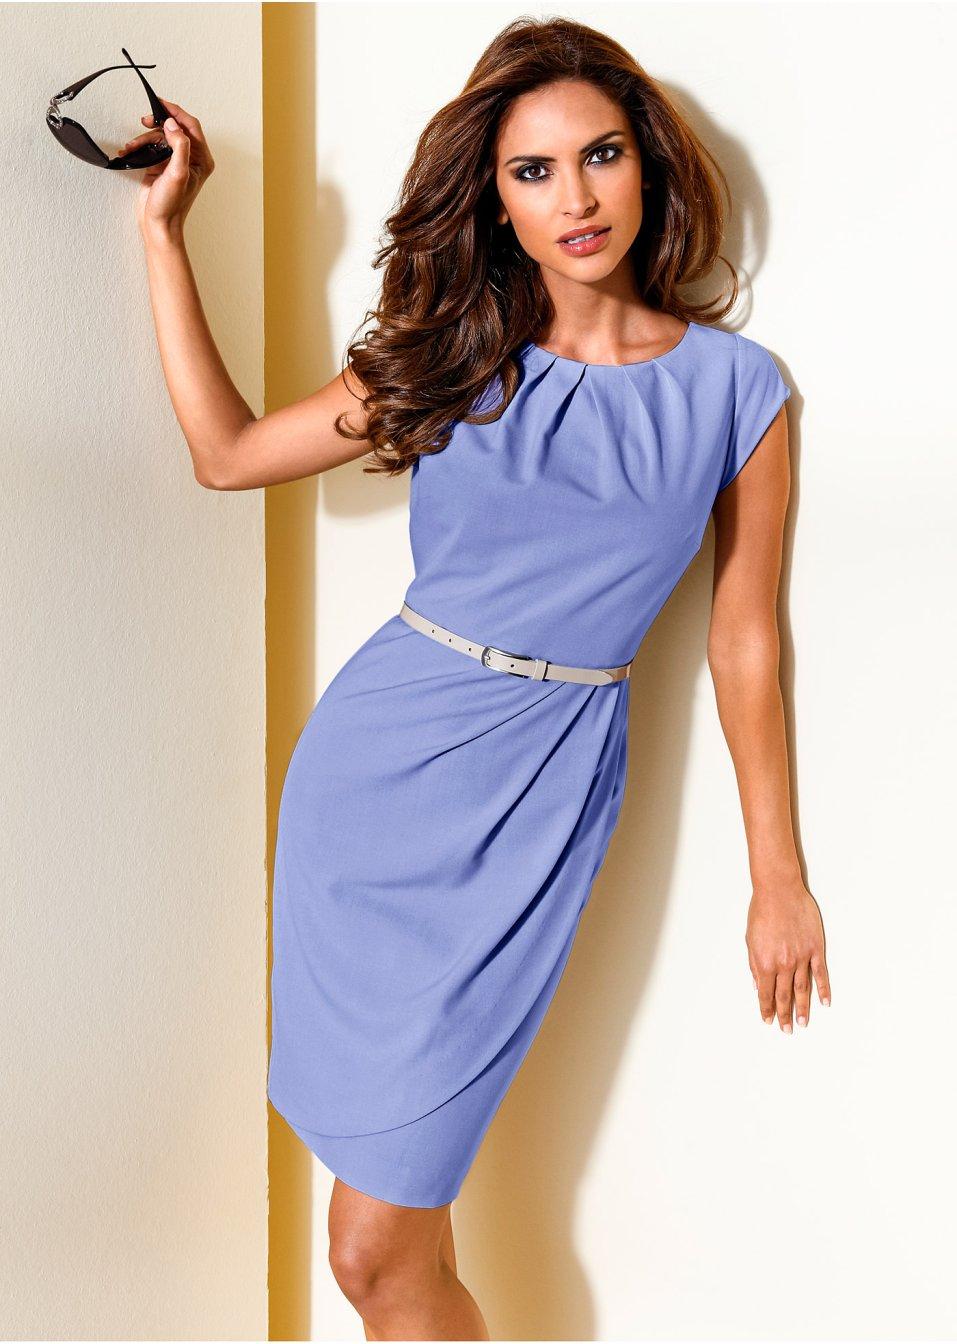 vestido tubinho azul claro moda feminina. Black Bedroom Furniture Sets. Home Design Ideas